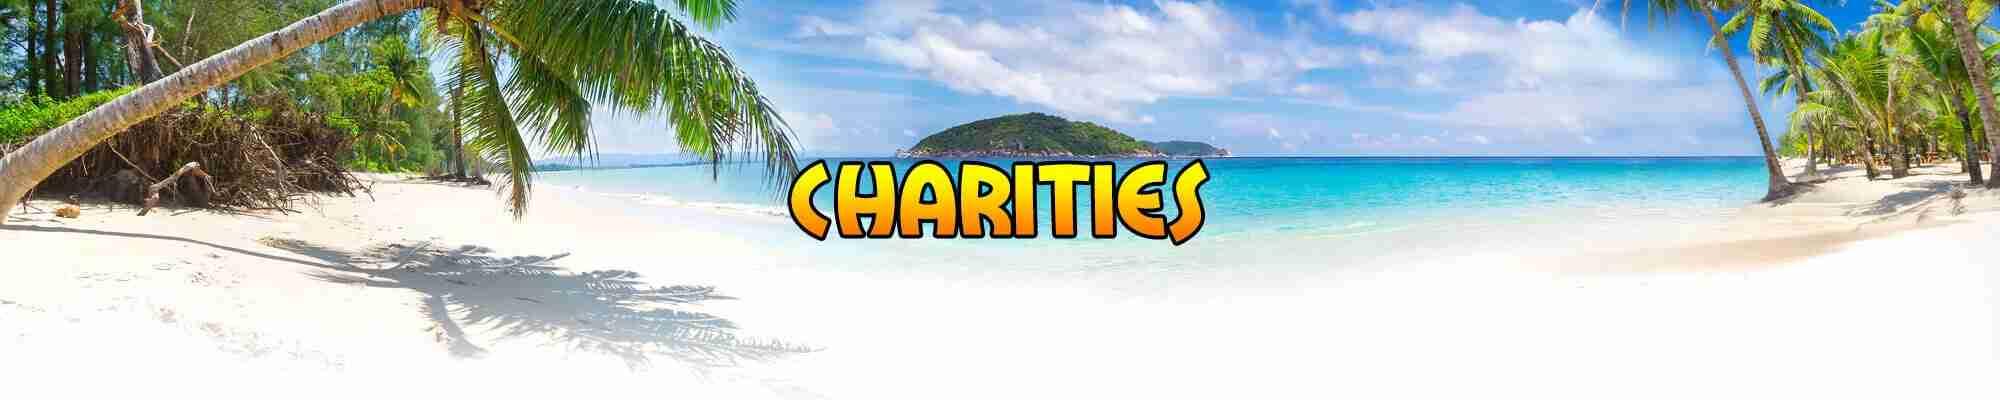 Charities Header